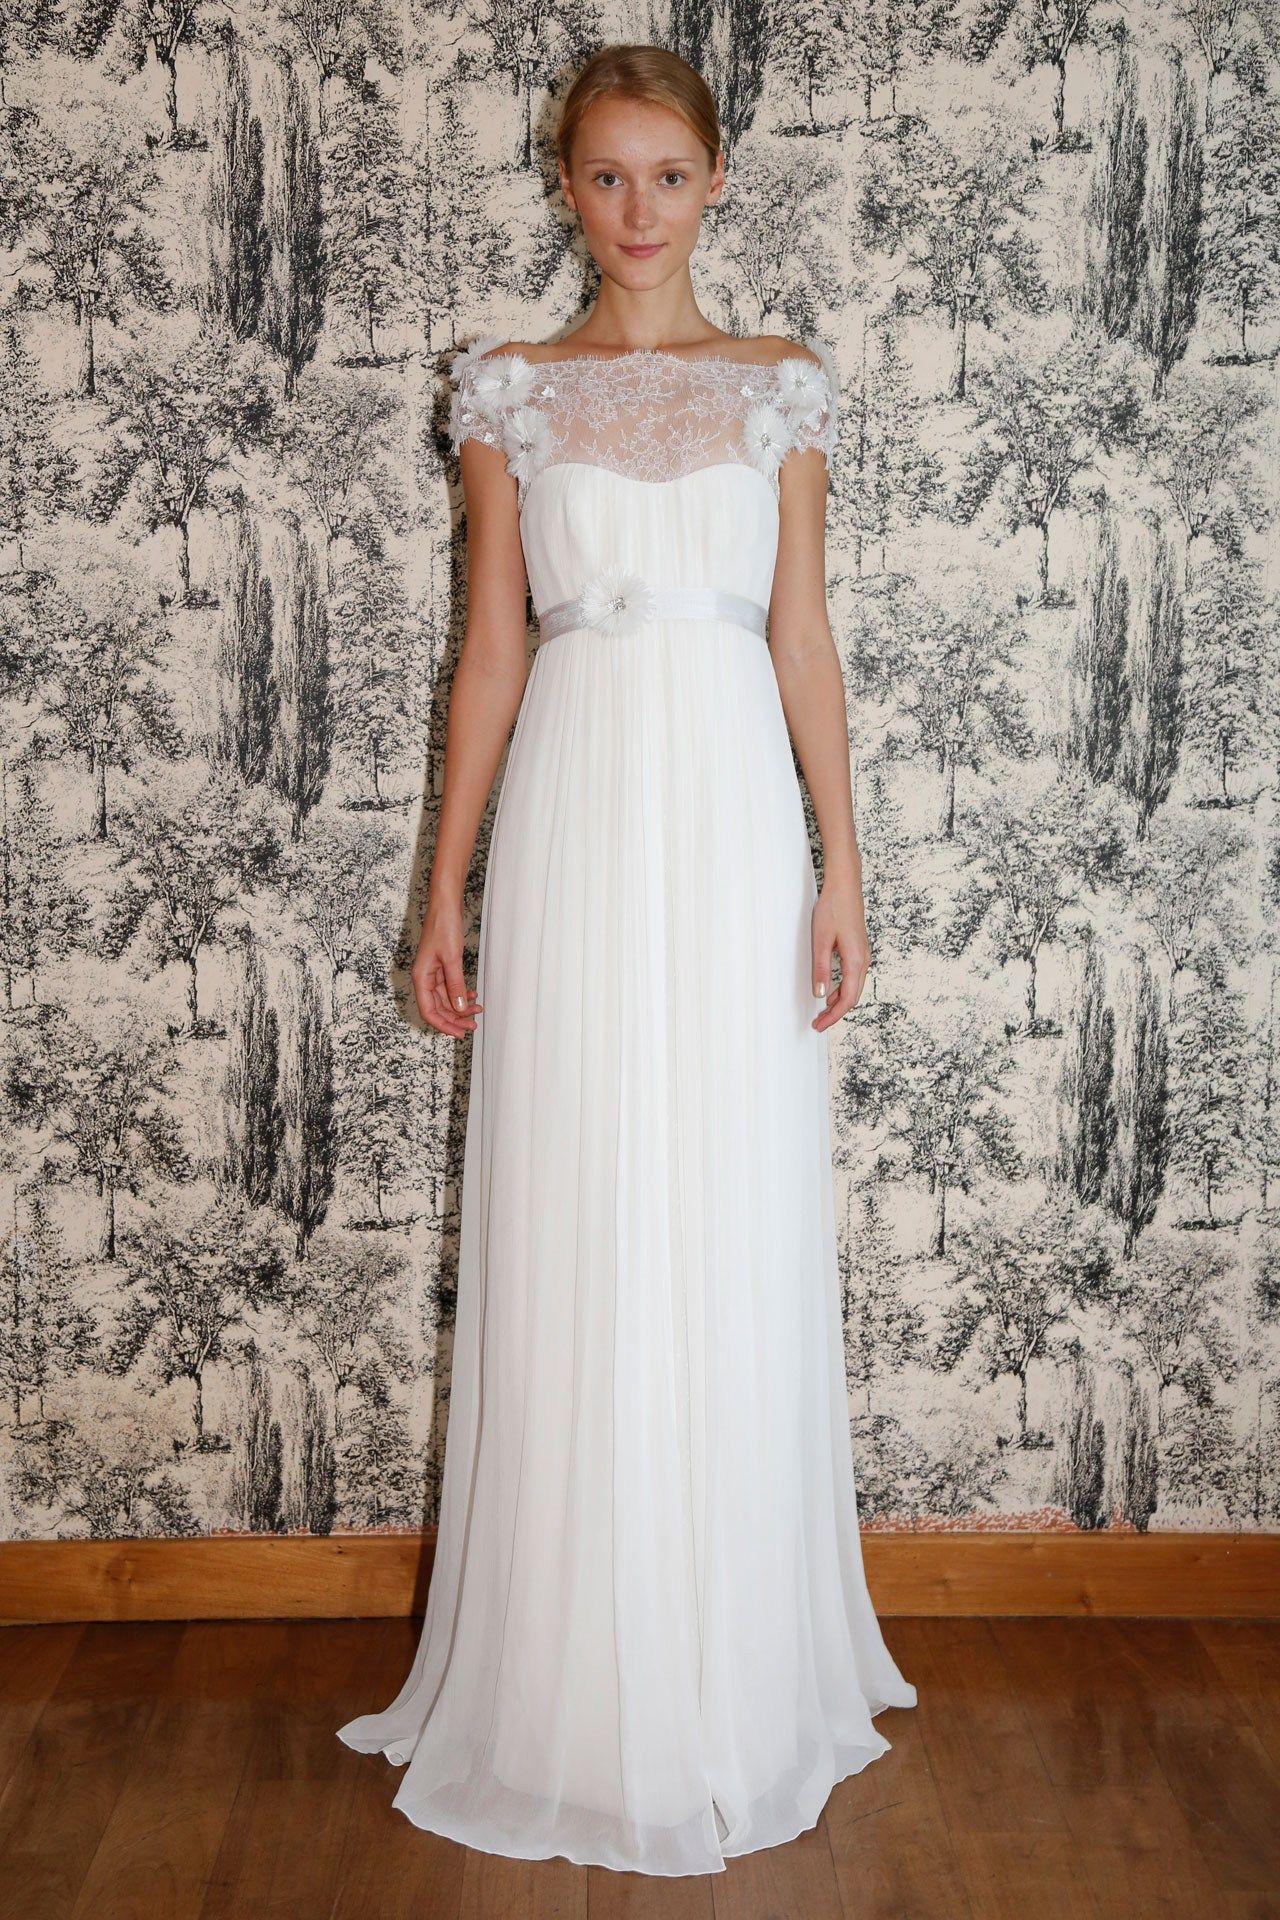 Cream dresses for weddings  Wedding Dresses  The Ultimate Gallery BridesMagazine